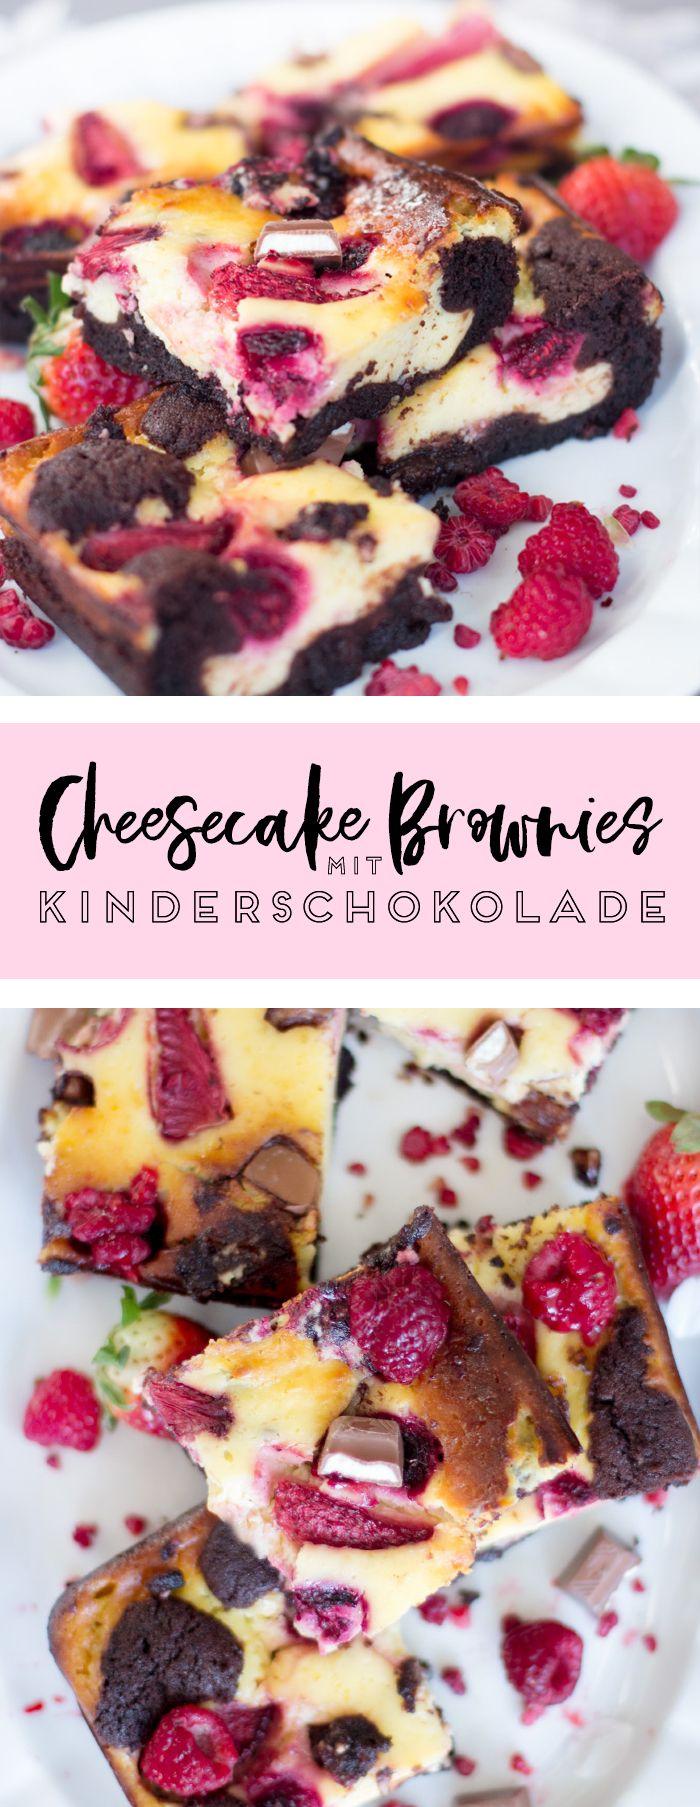 Cheesecake-Brownies mit Beeren und Kinderschokolade